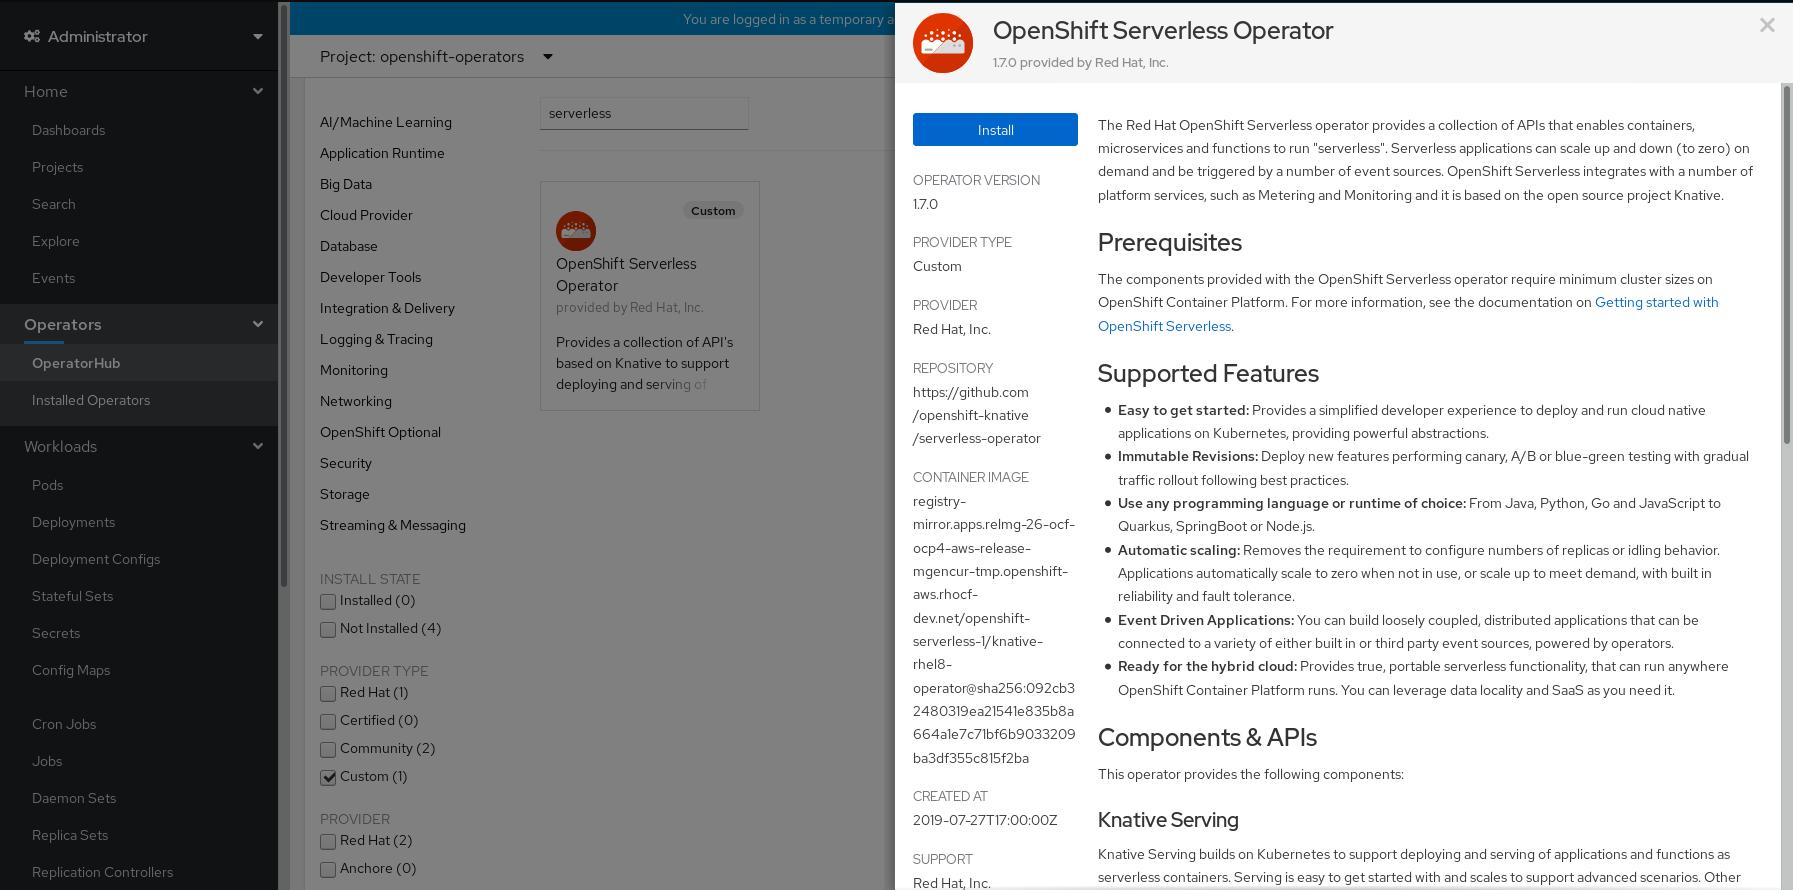 OpenShift Serverless Operator information